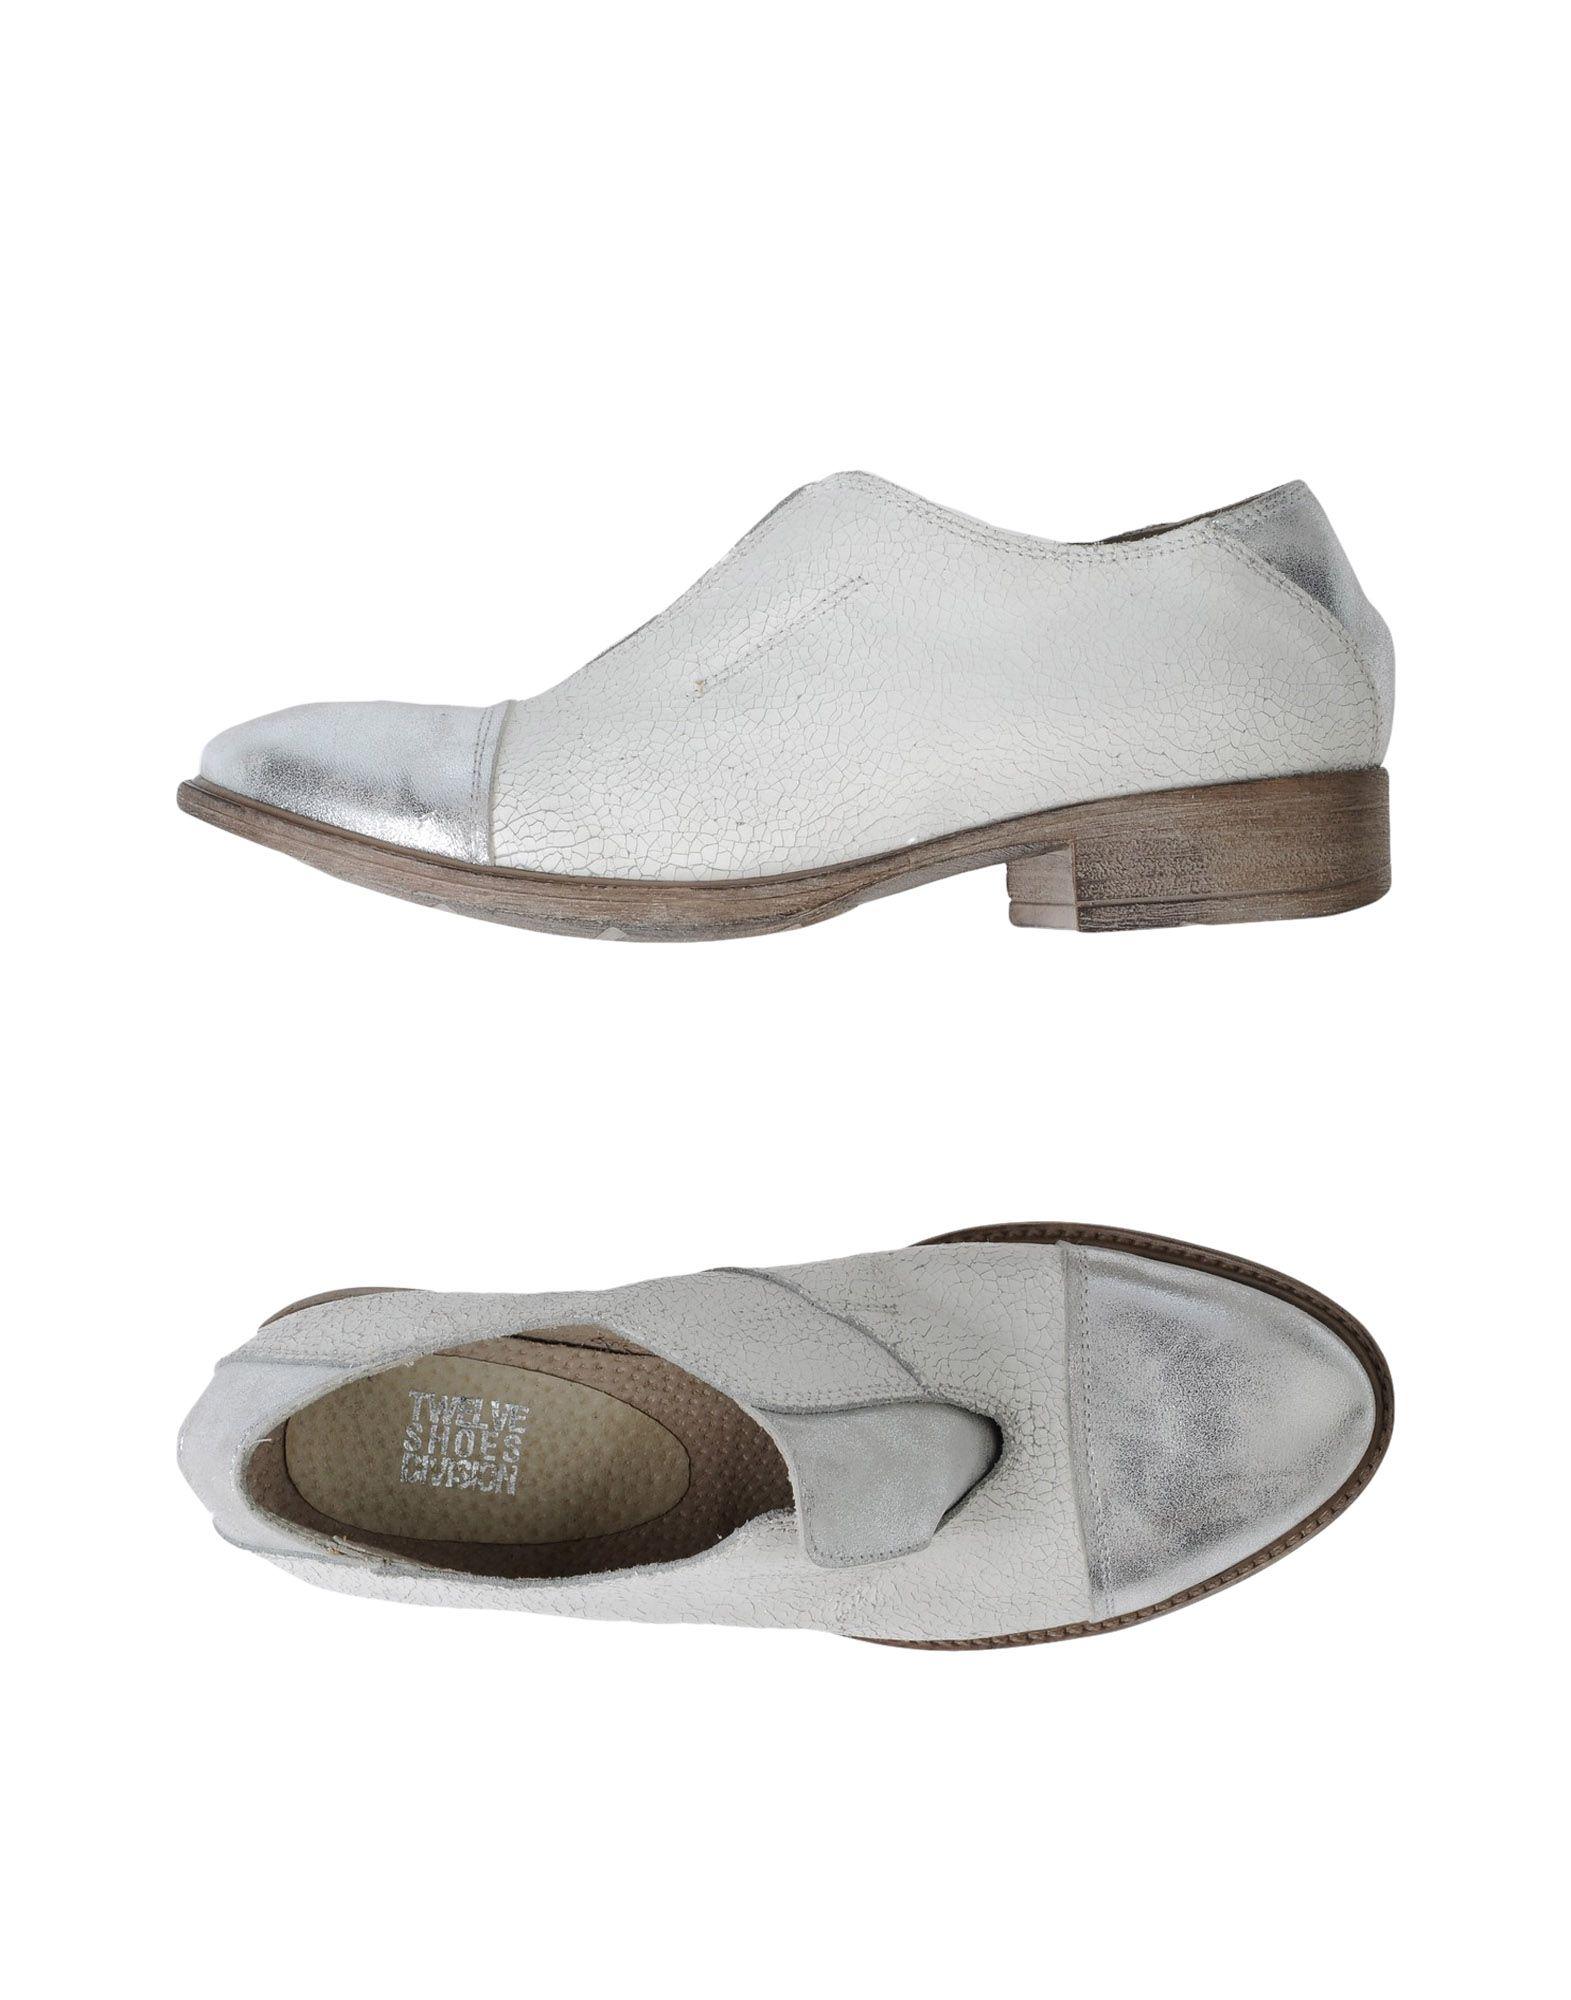 Tsd12 Loafers online - Women Tsd12 Loafers online Loafers on  United Kingdom - 11338774ET 74c8d8